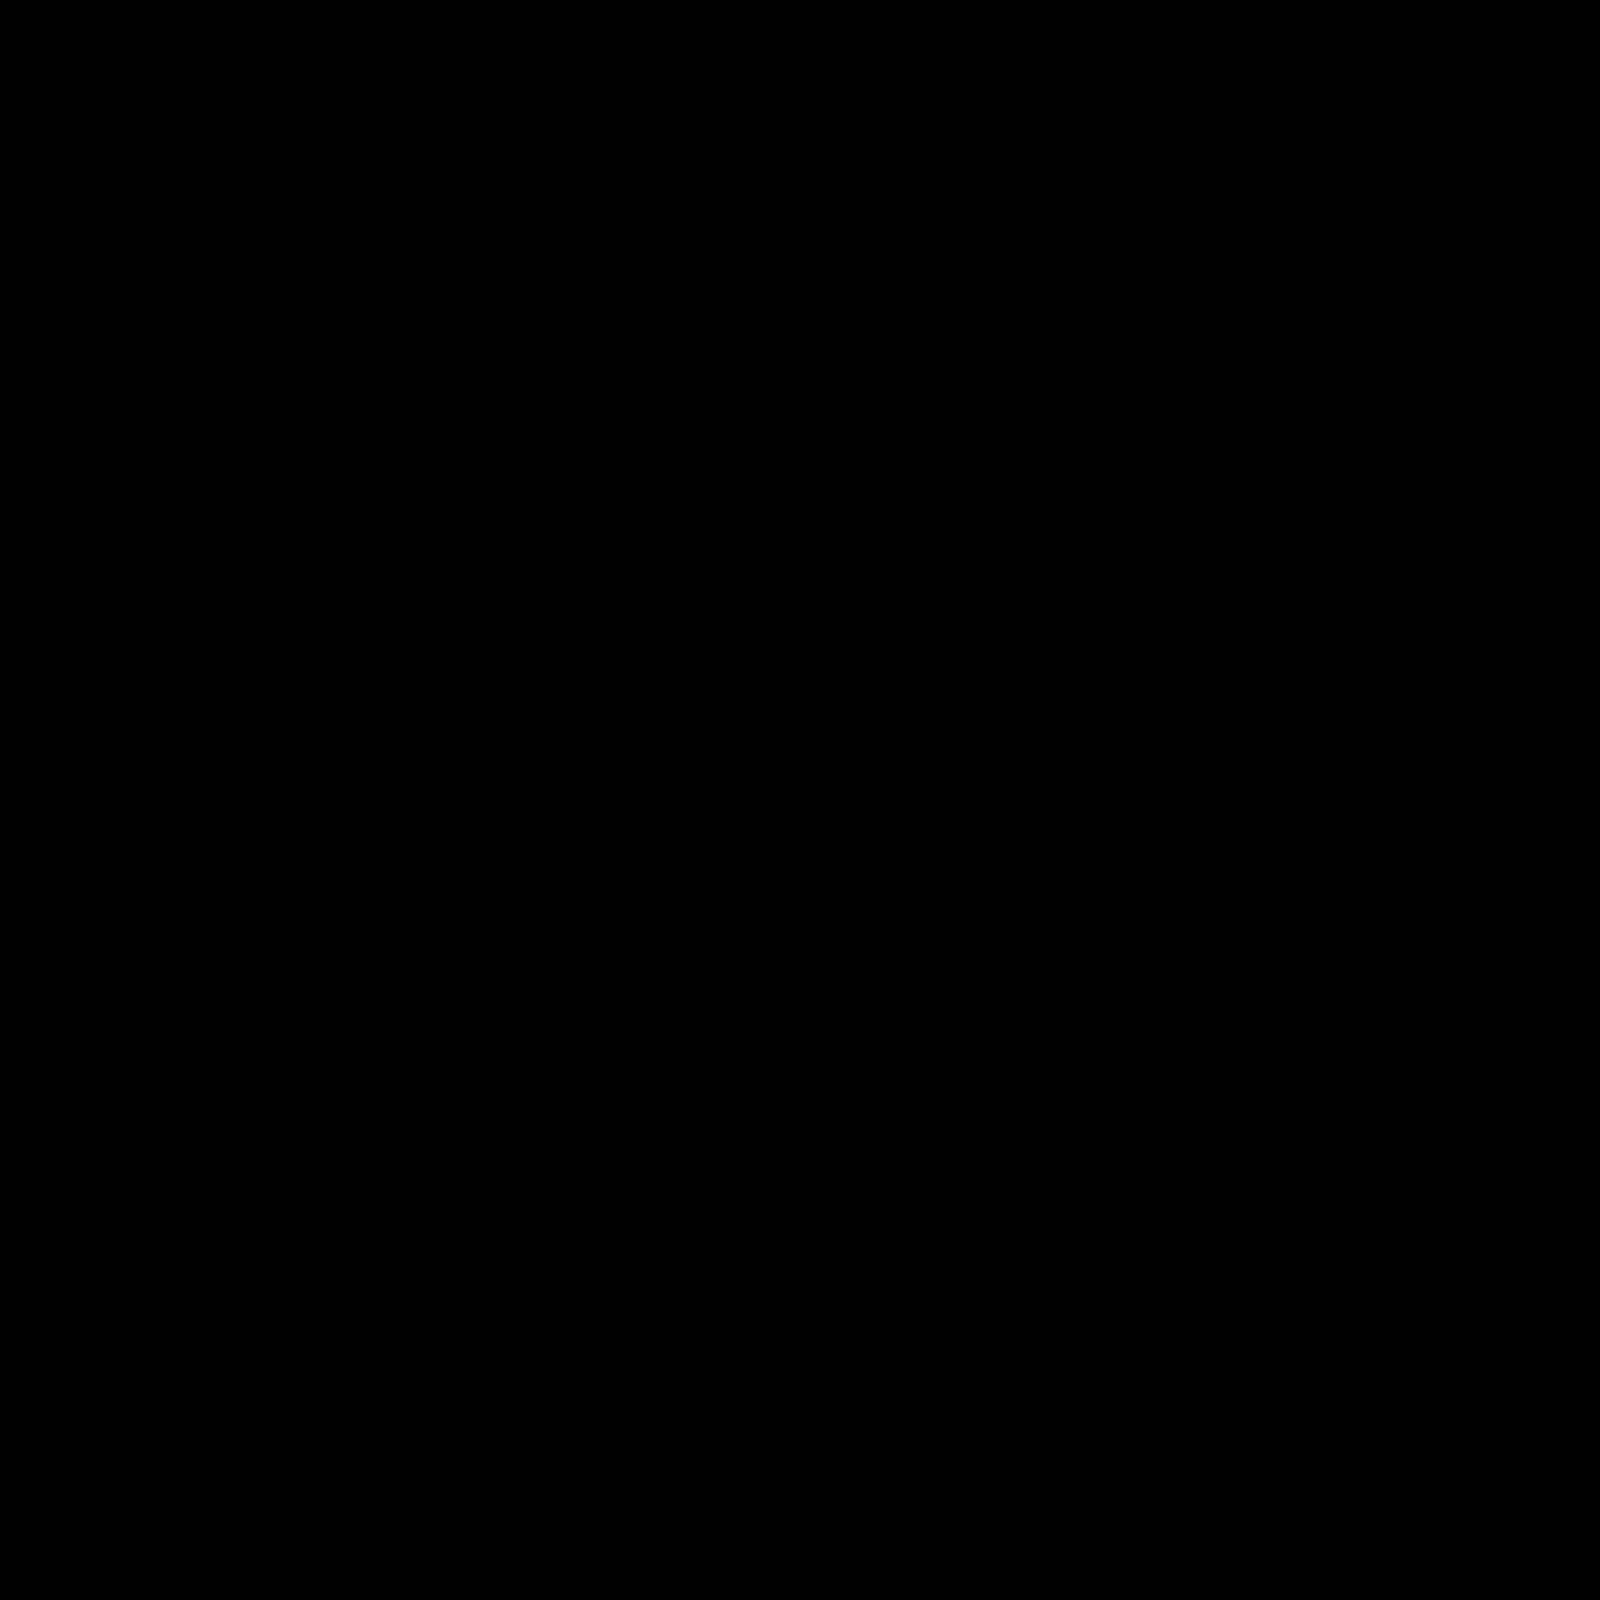 Defrosting icon